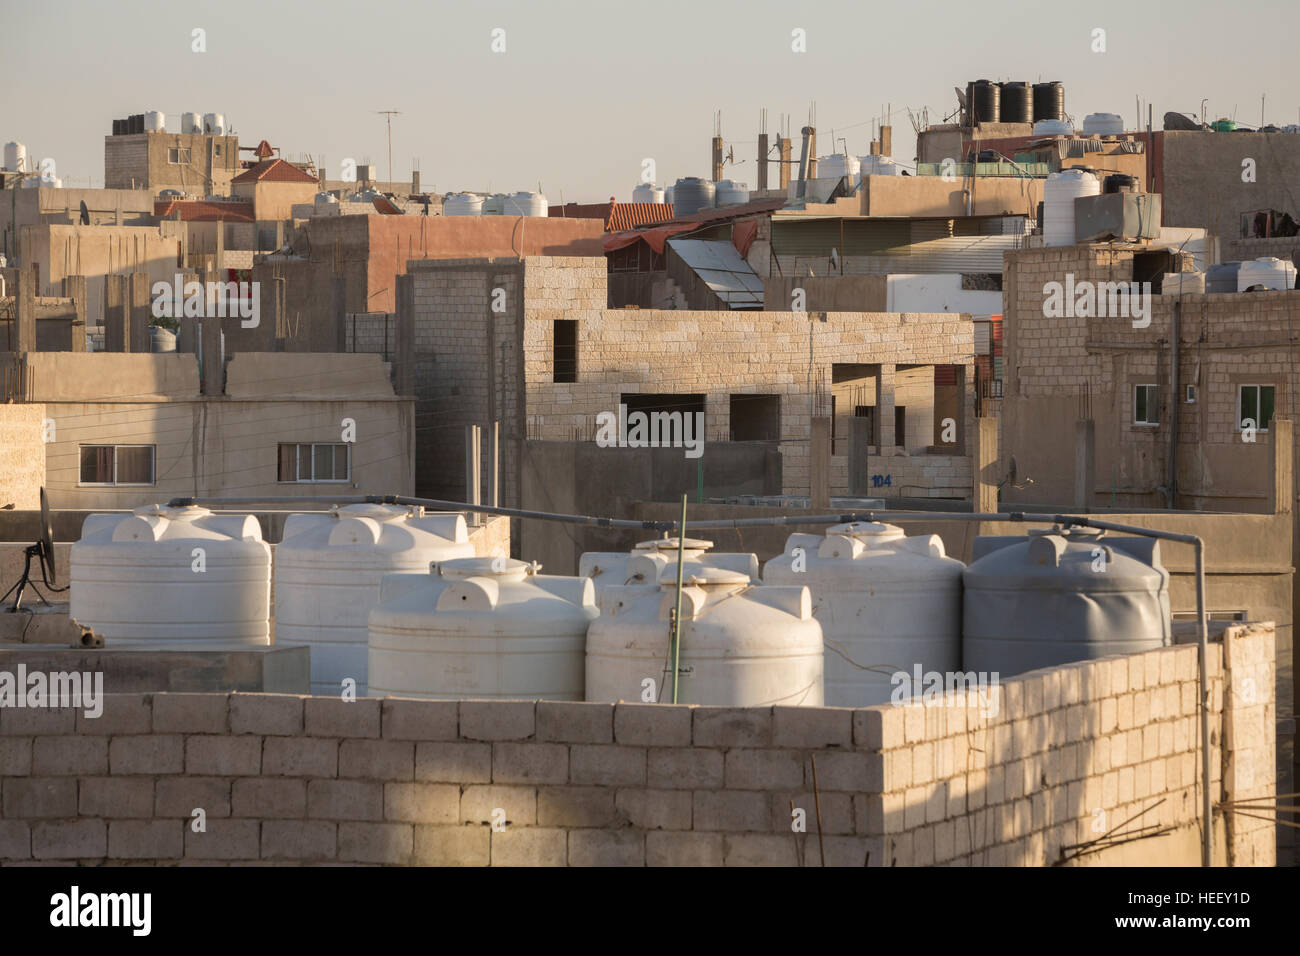 Water storage tanks sit on a rooftop in Zarqa, Jordan. - Stock Image